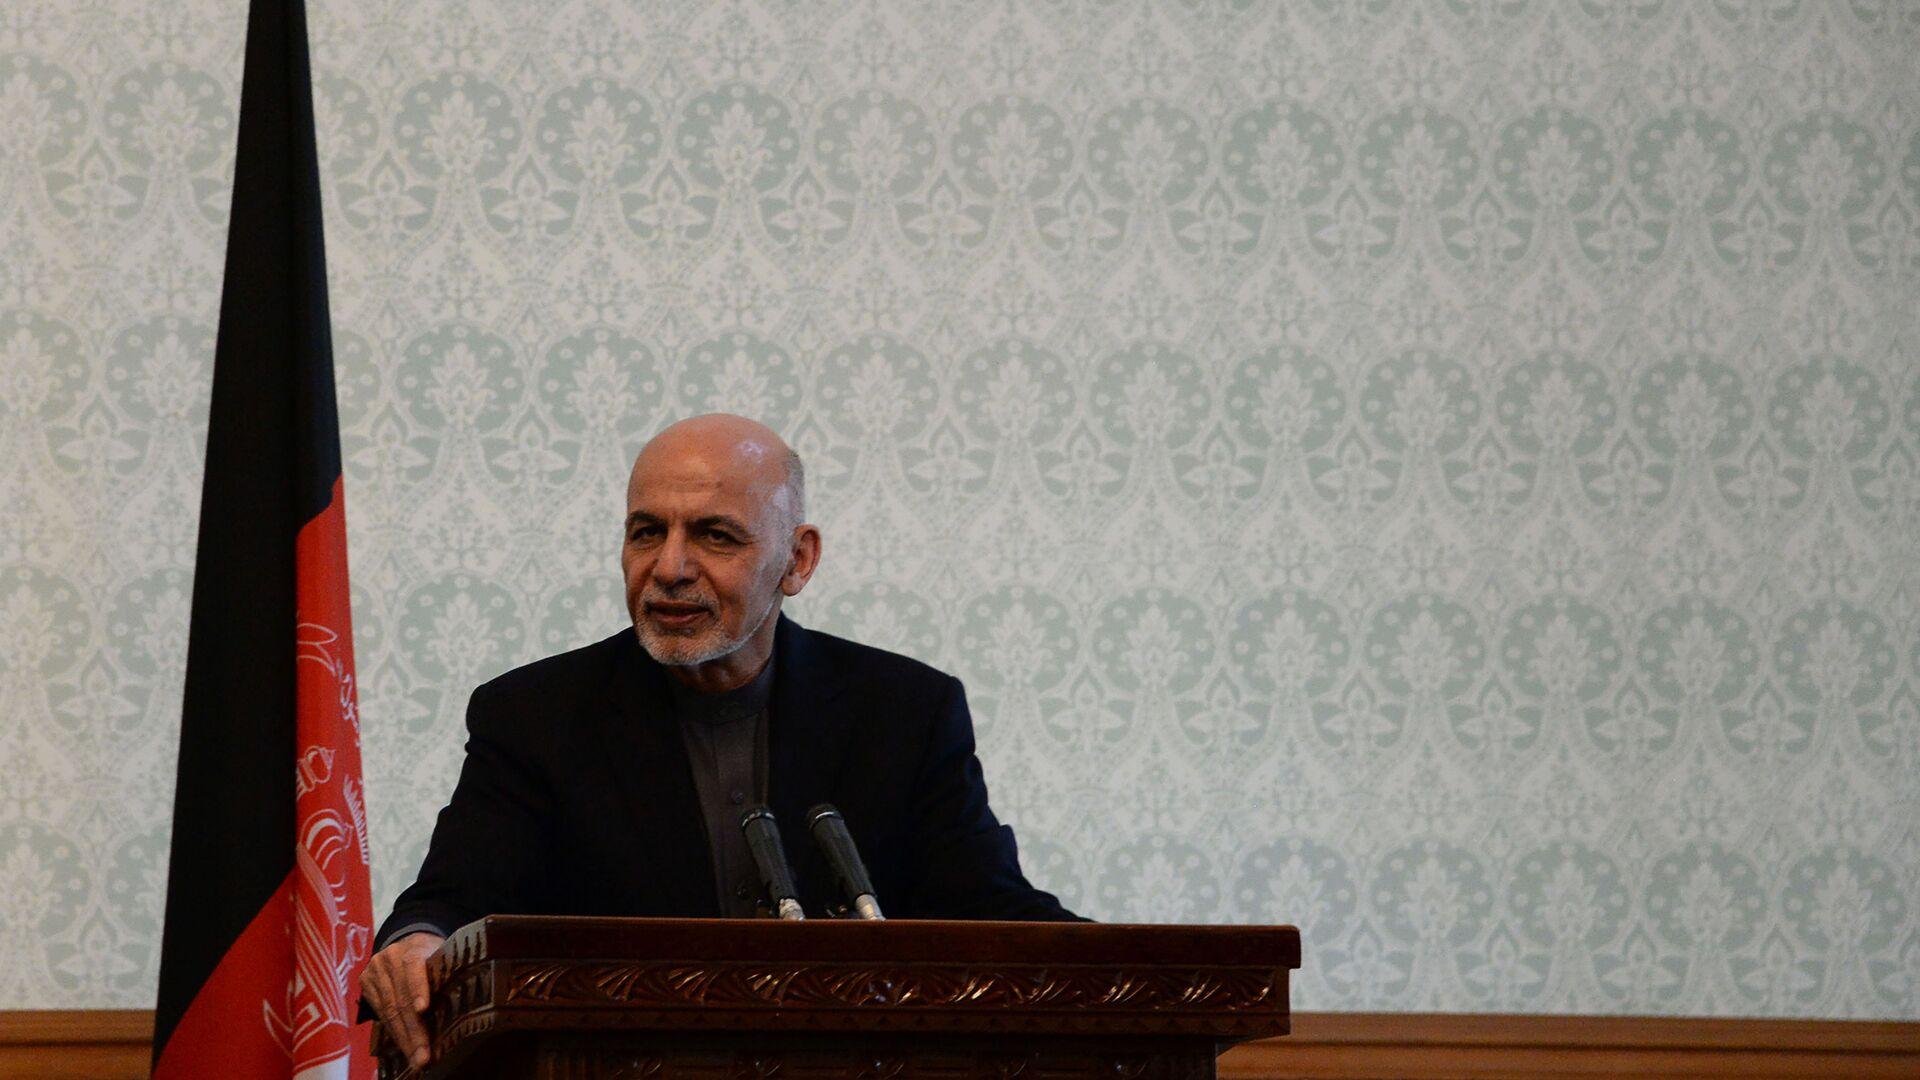 Presidente dell'Afghanistan Ashraf Ghani - Sputnik Italia, 1920, 14.08.2021